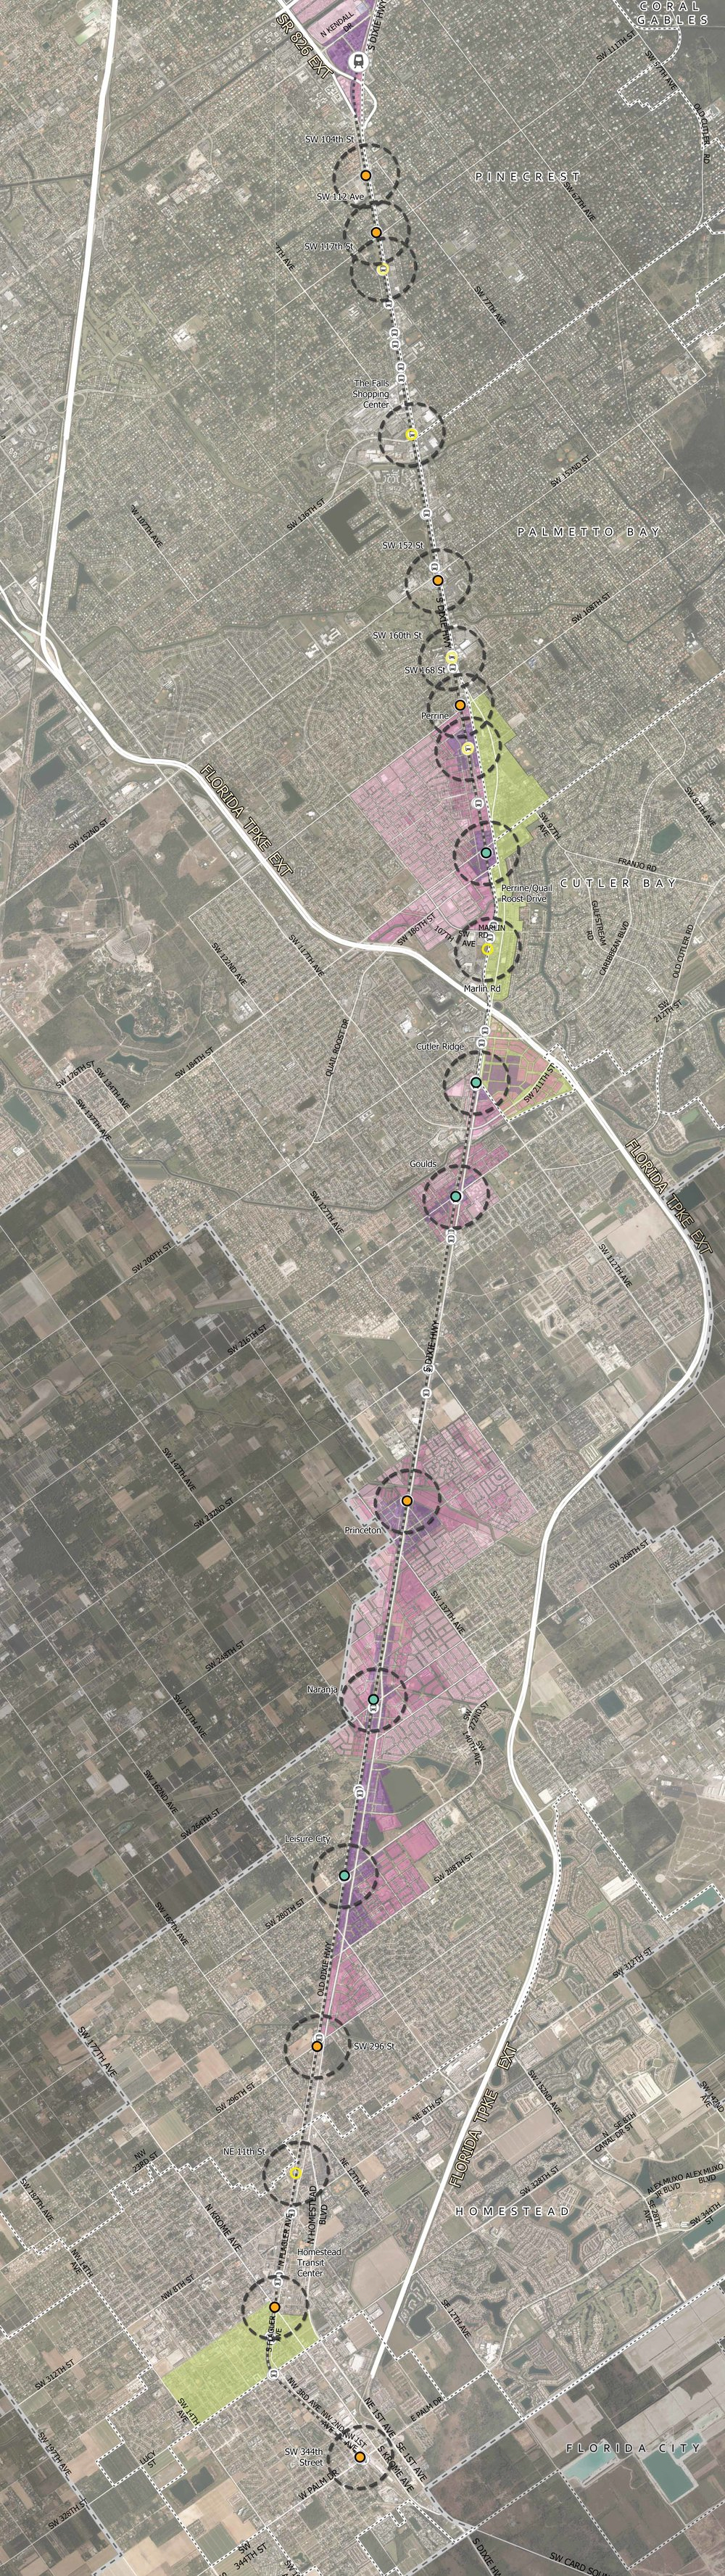 Corridor Map 1-2000.jpg